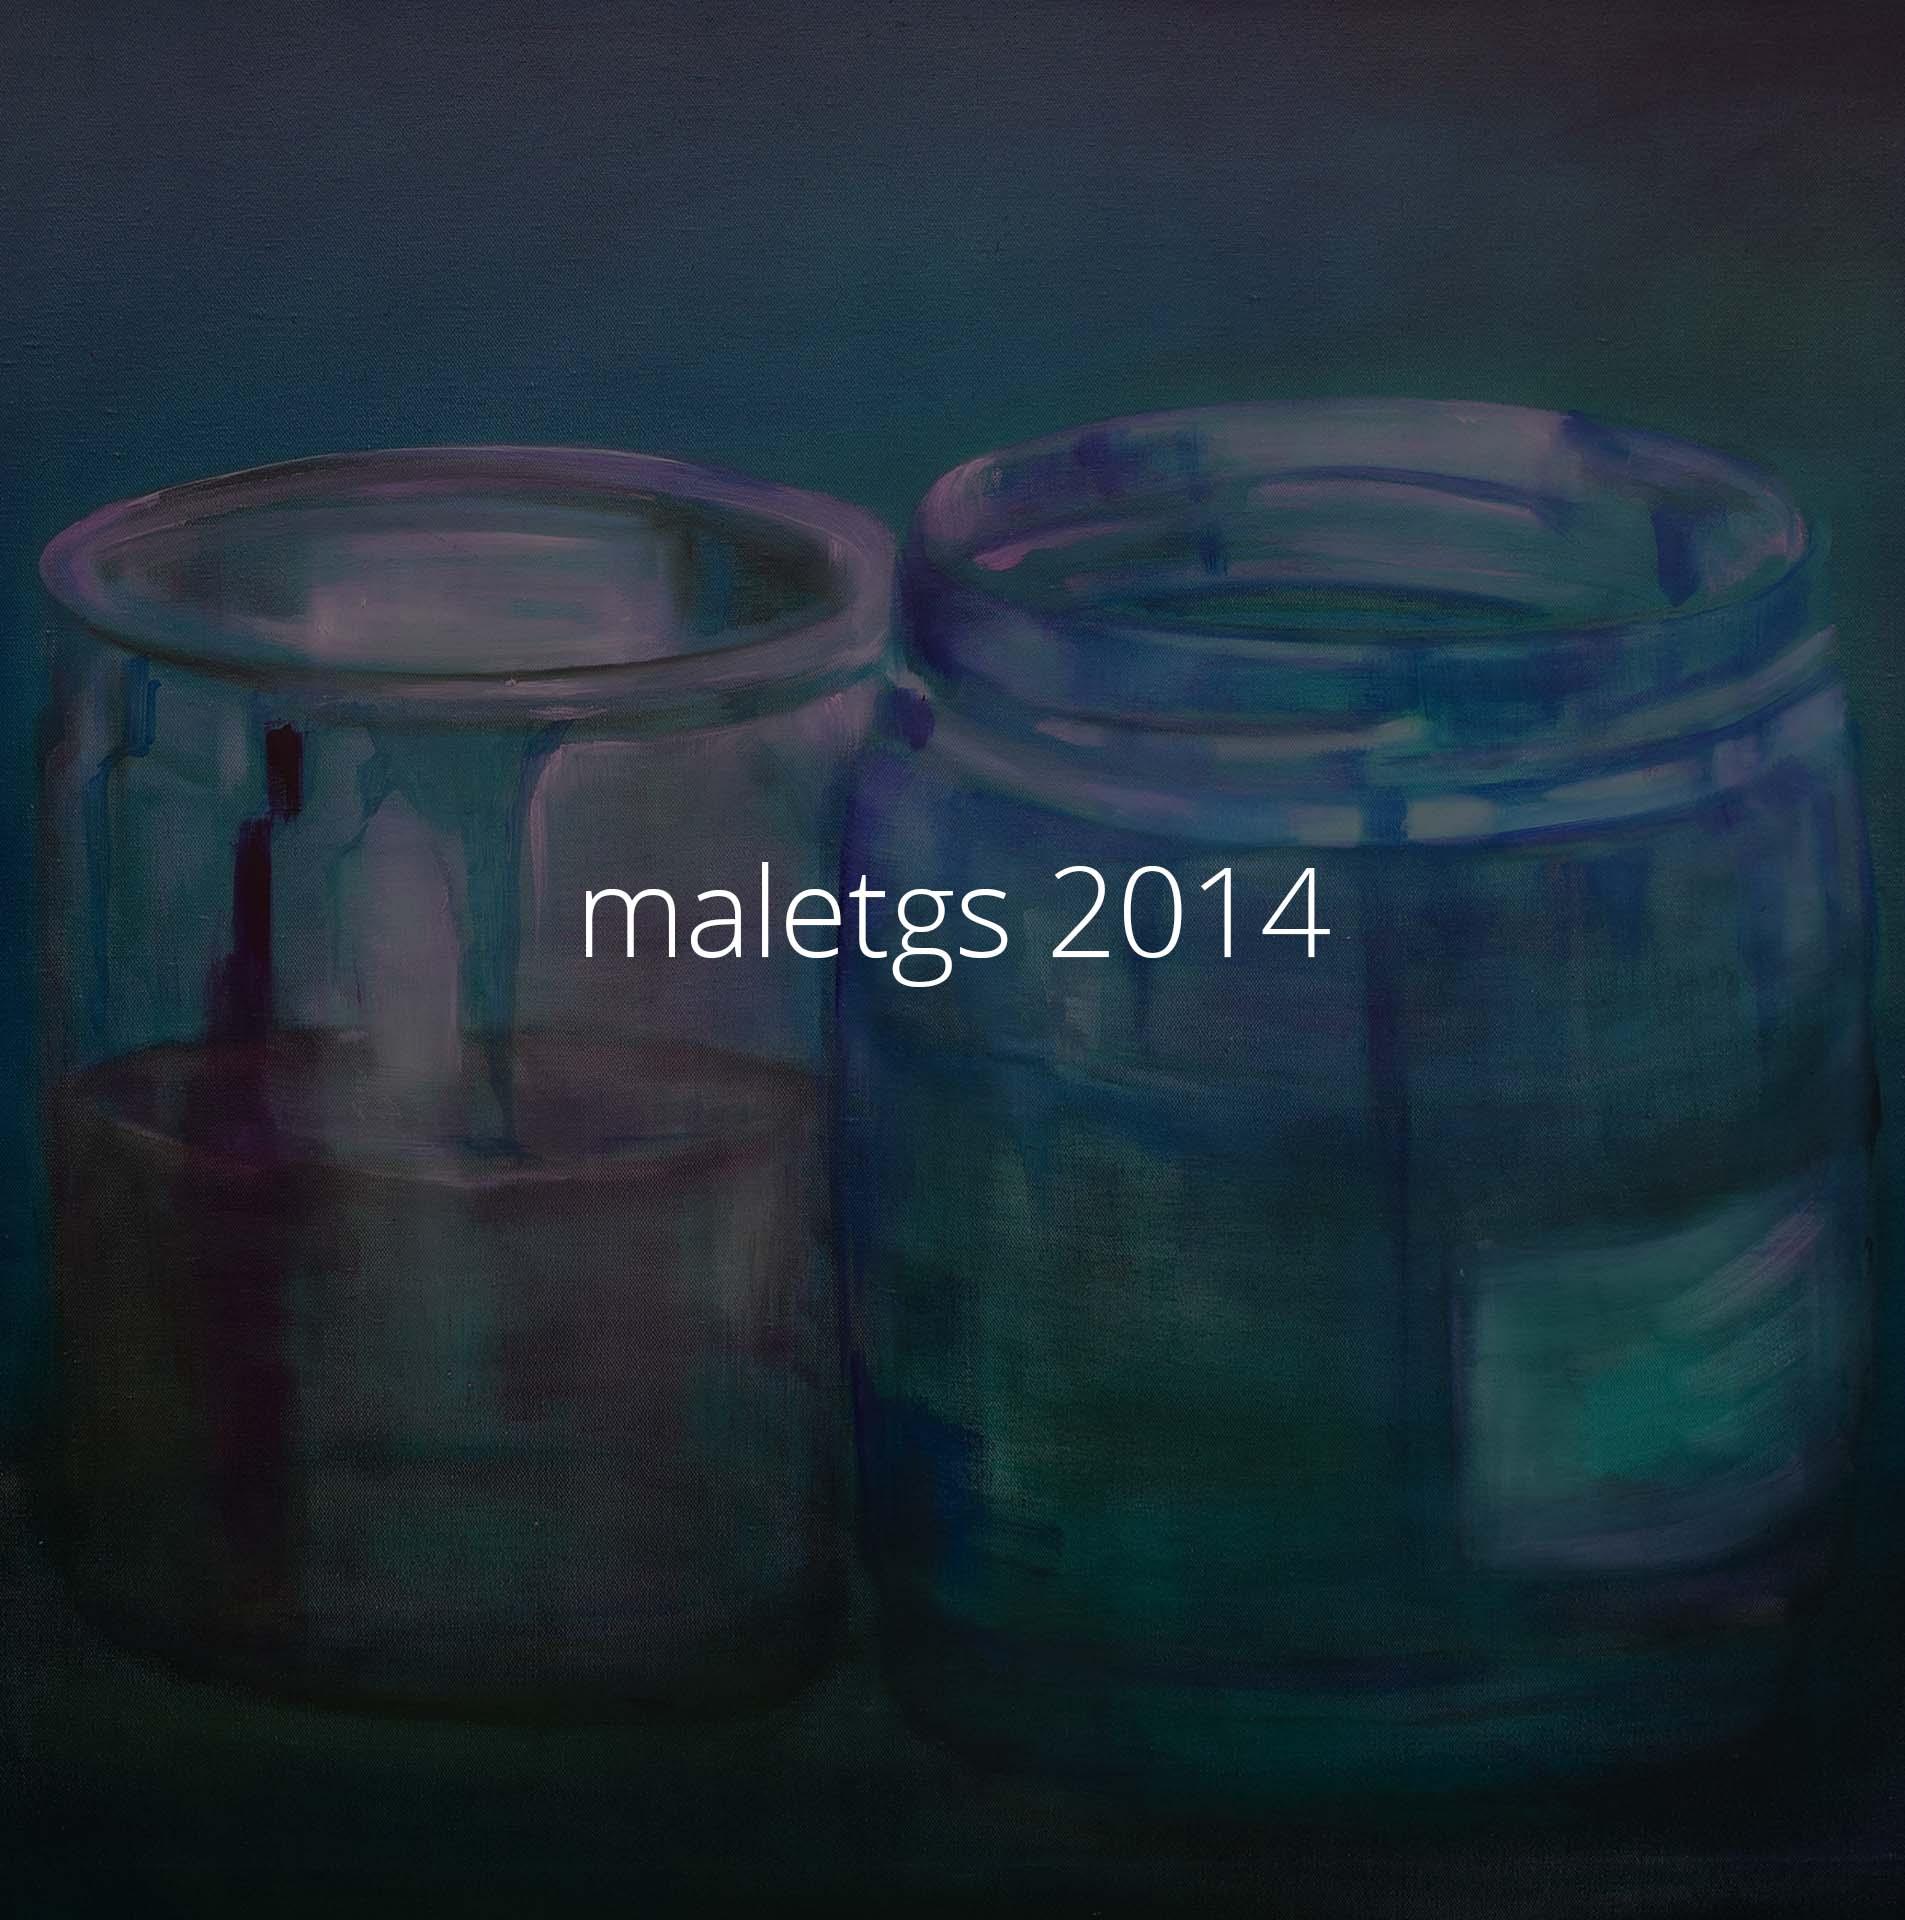 maletgs 2014